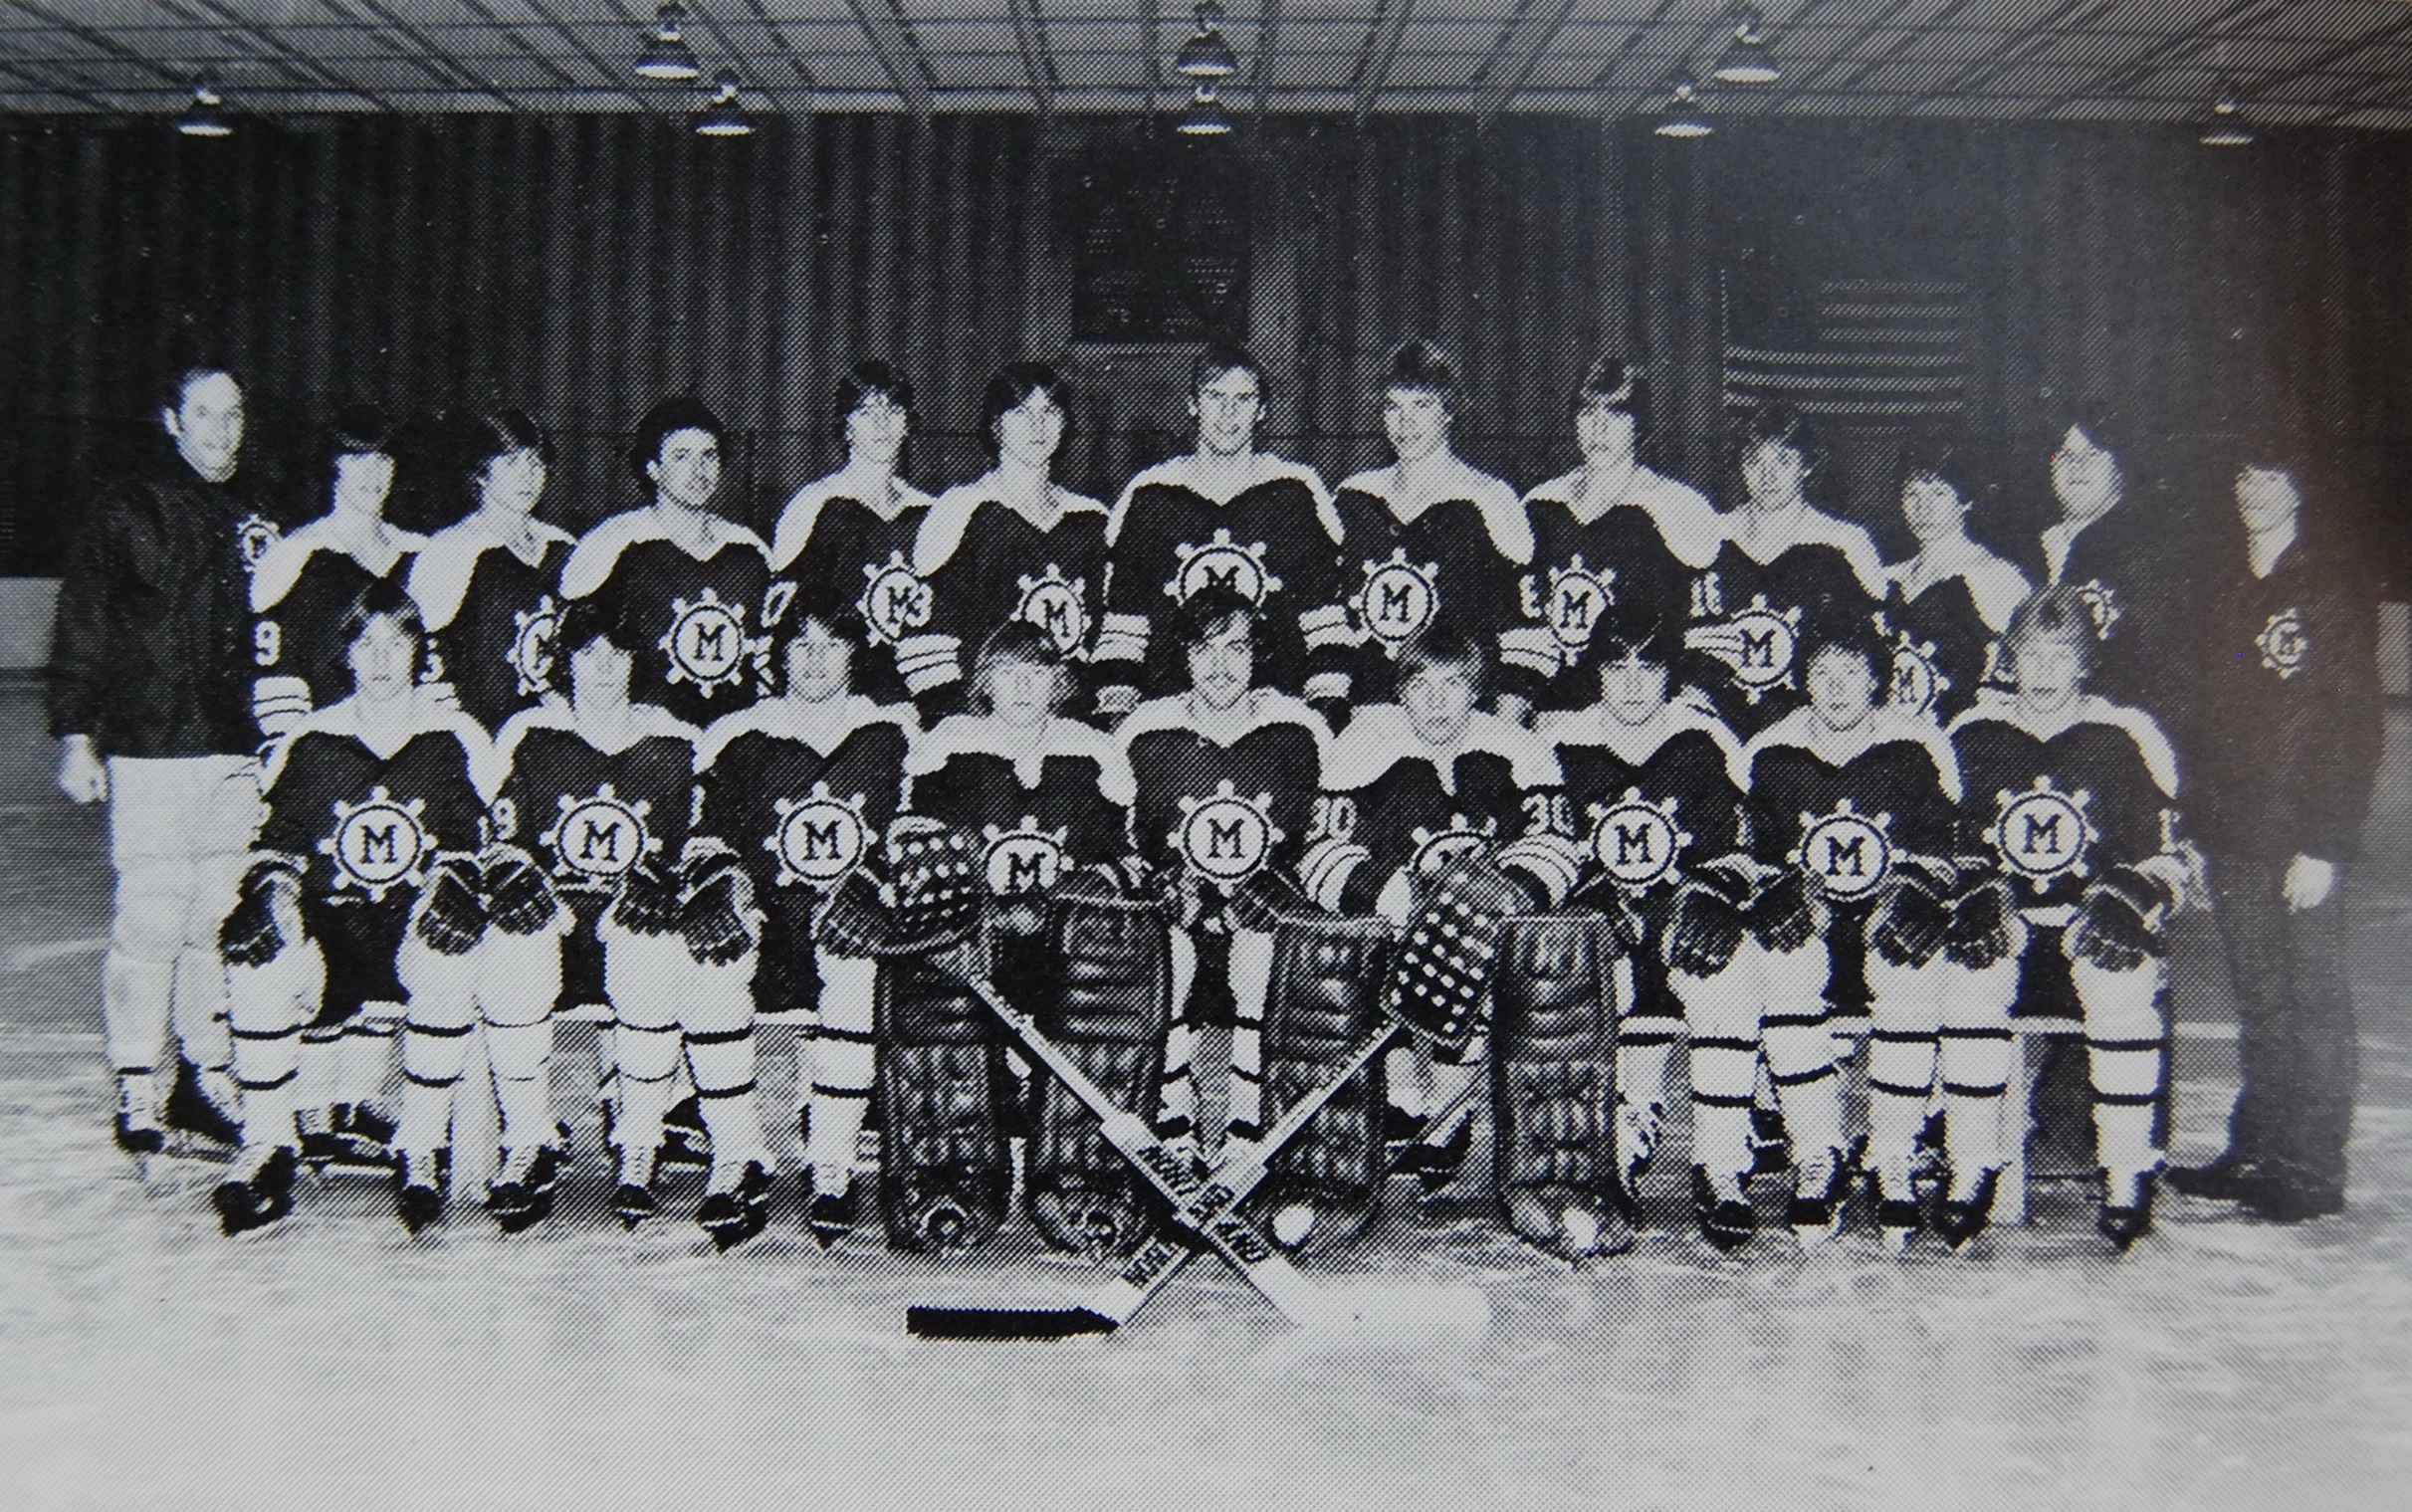 March 11 12 13 1982 St Paul Civic Center